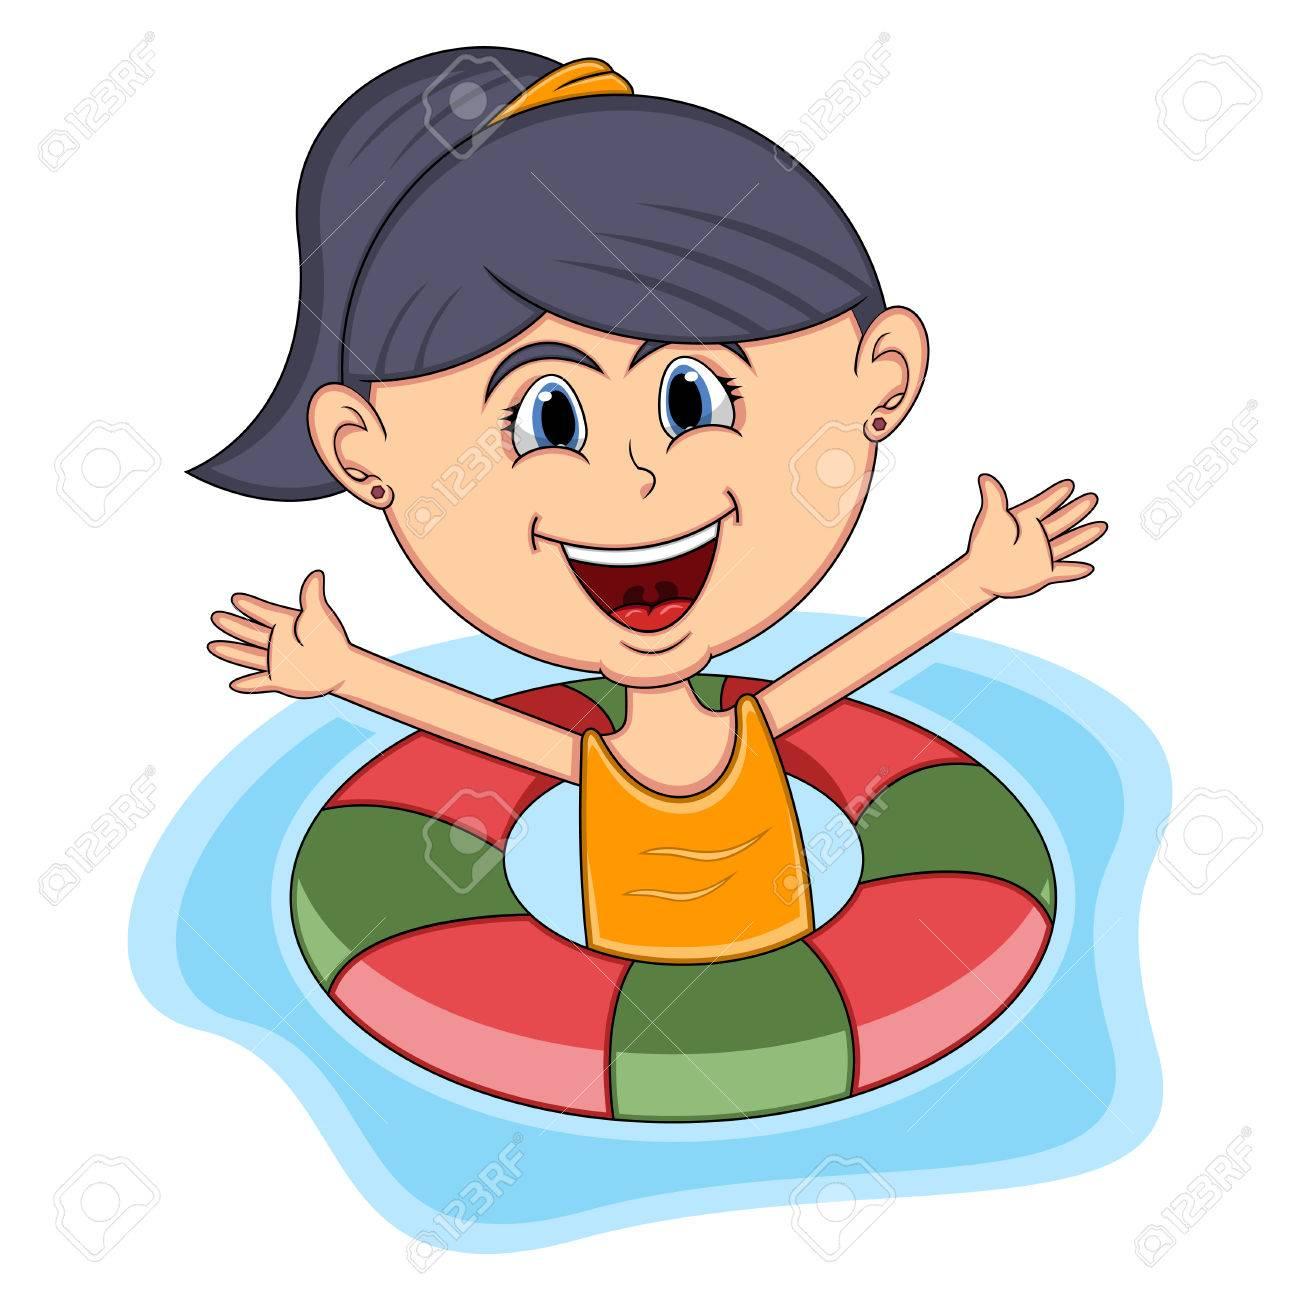 1300x1300 Girls Swimming Cartoon Royalty Free Cliparts, Vectors, And Stock